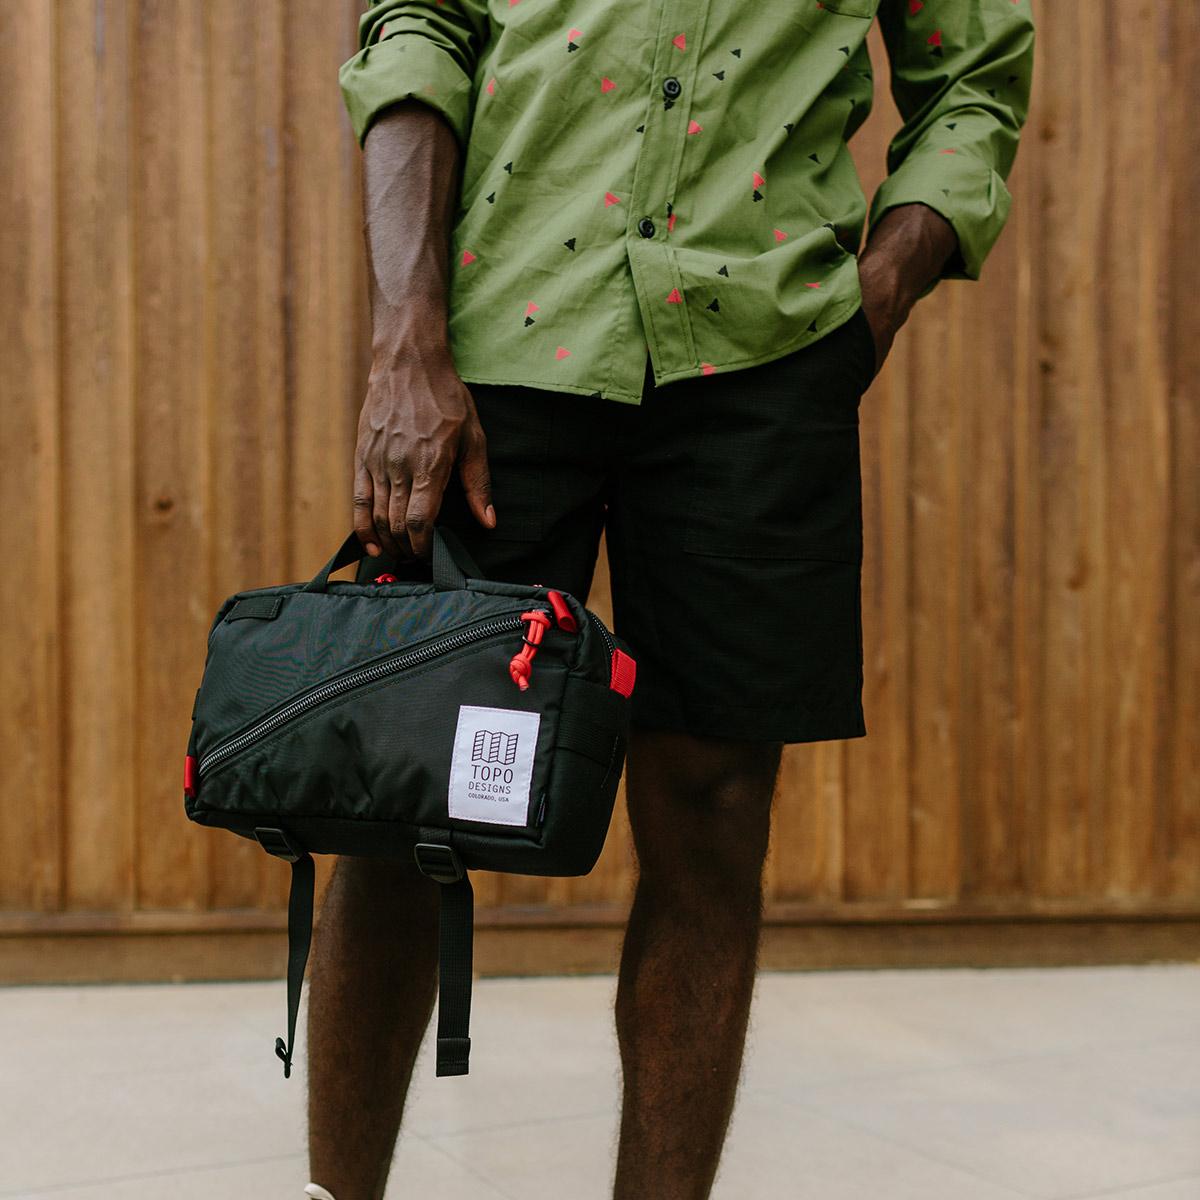 Topo Designs Quick Pack Black, Introducing Topo Designs secure travel bag